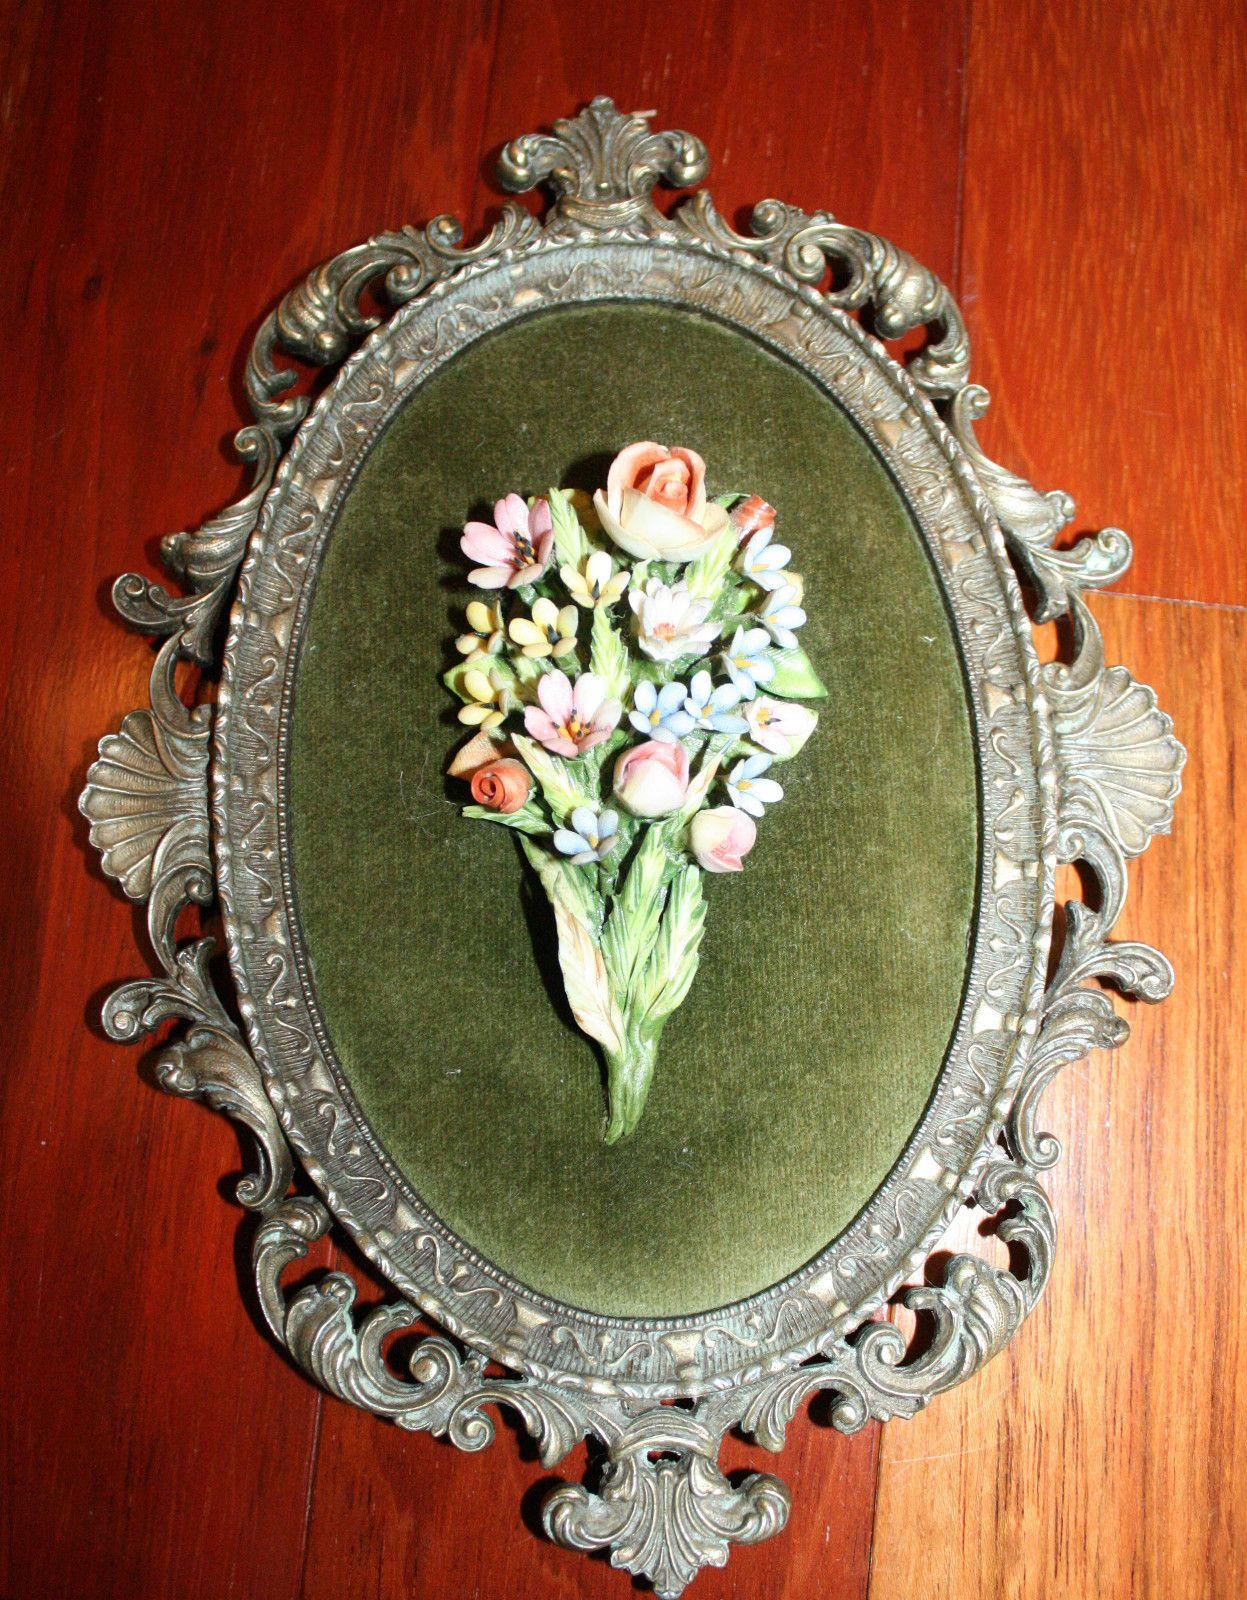 Vintage Brass Oval Framed China Flowers on Velvet Mod Dep Made in ...